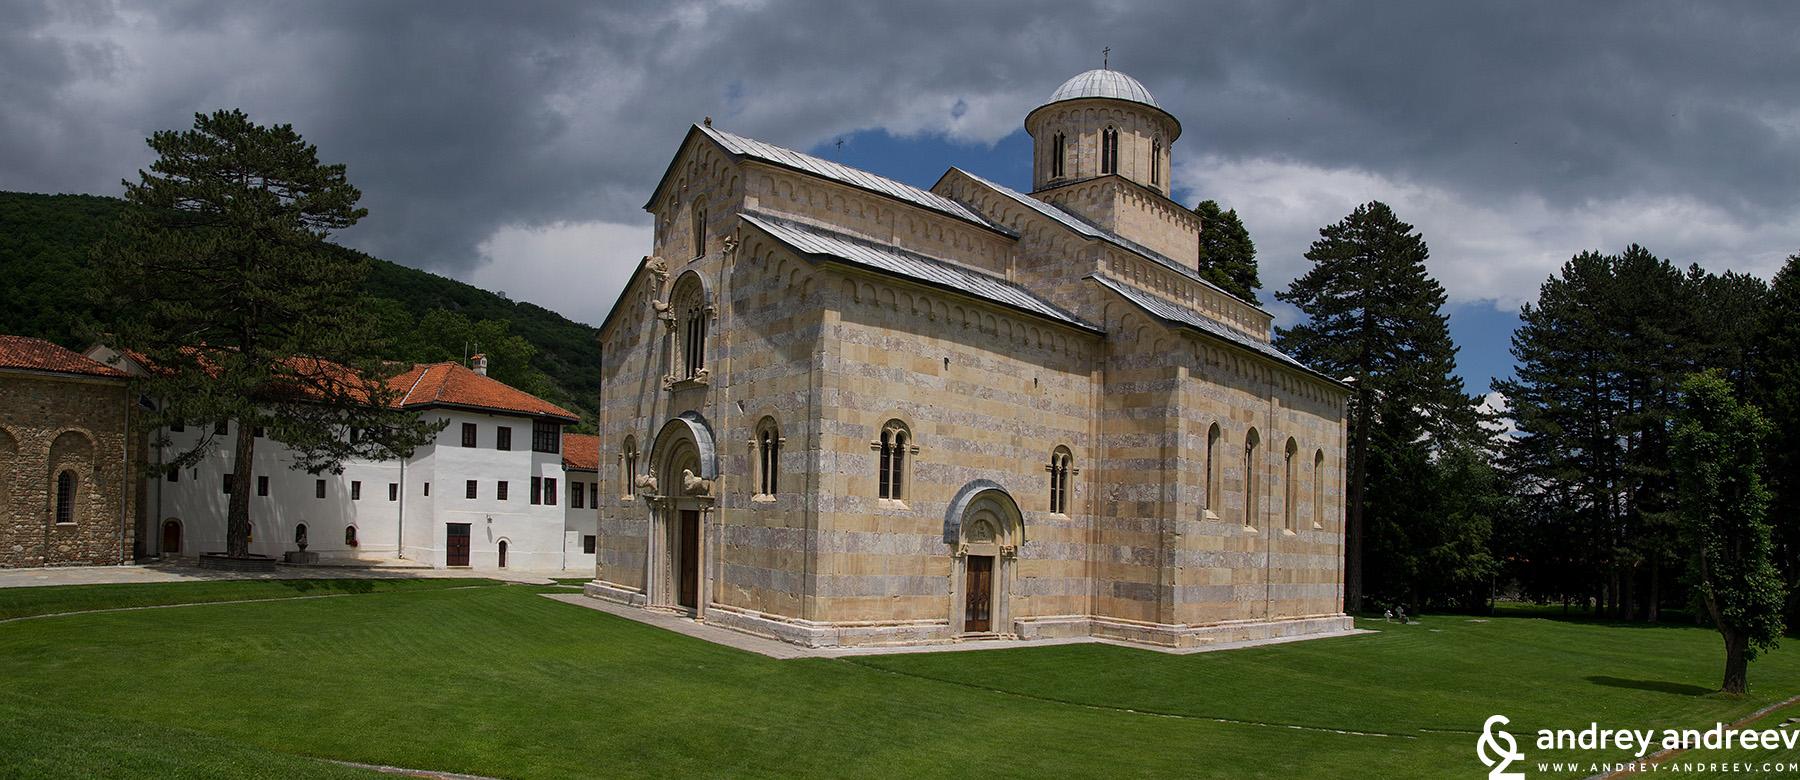 Манастир Високи Дечани / Visoki Dečani